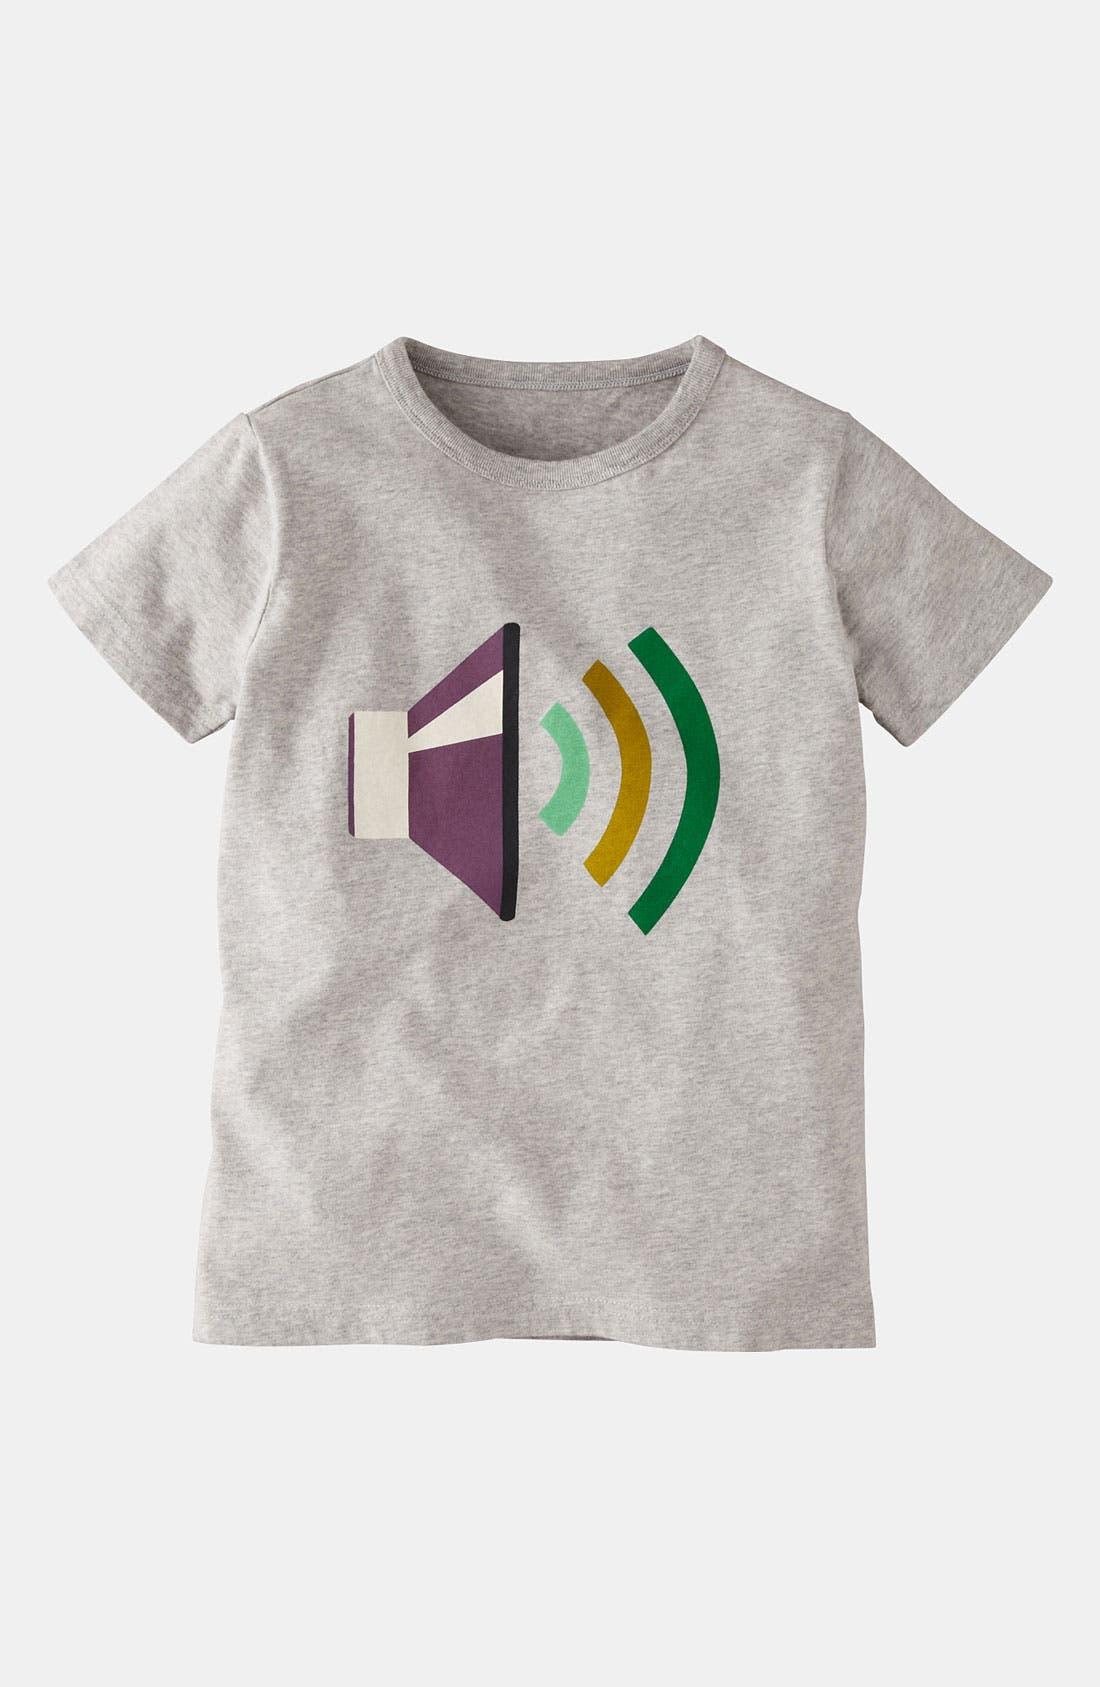 Alternate Image 1 Selected - Mini Boden Graphic T-Shirt (Toddler, Little Boys & Big Boys)